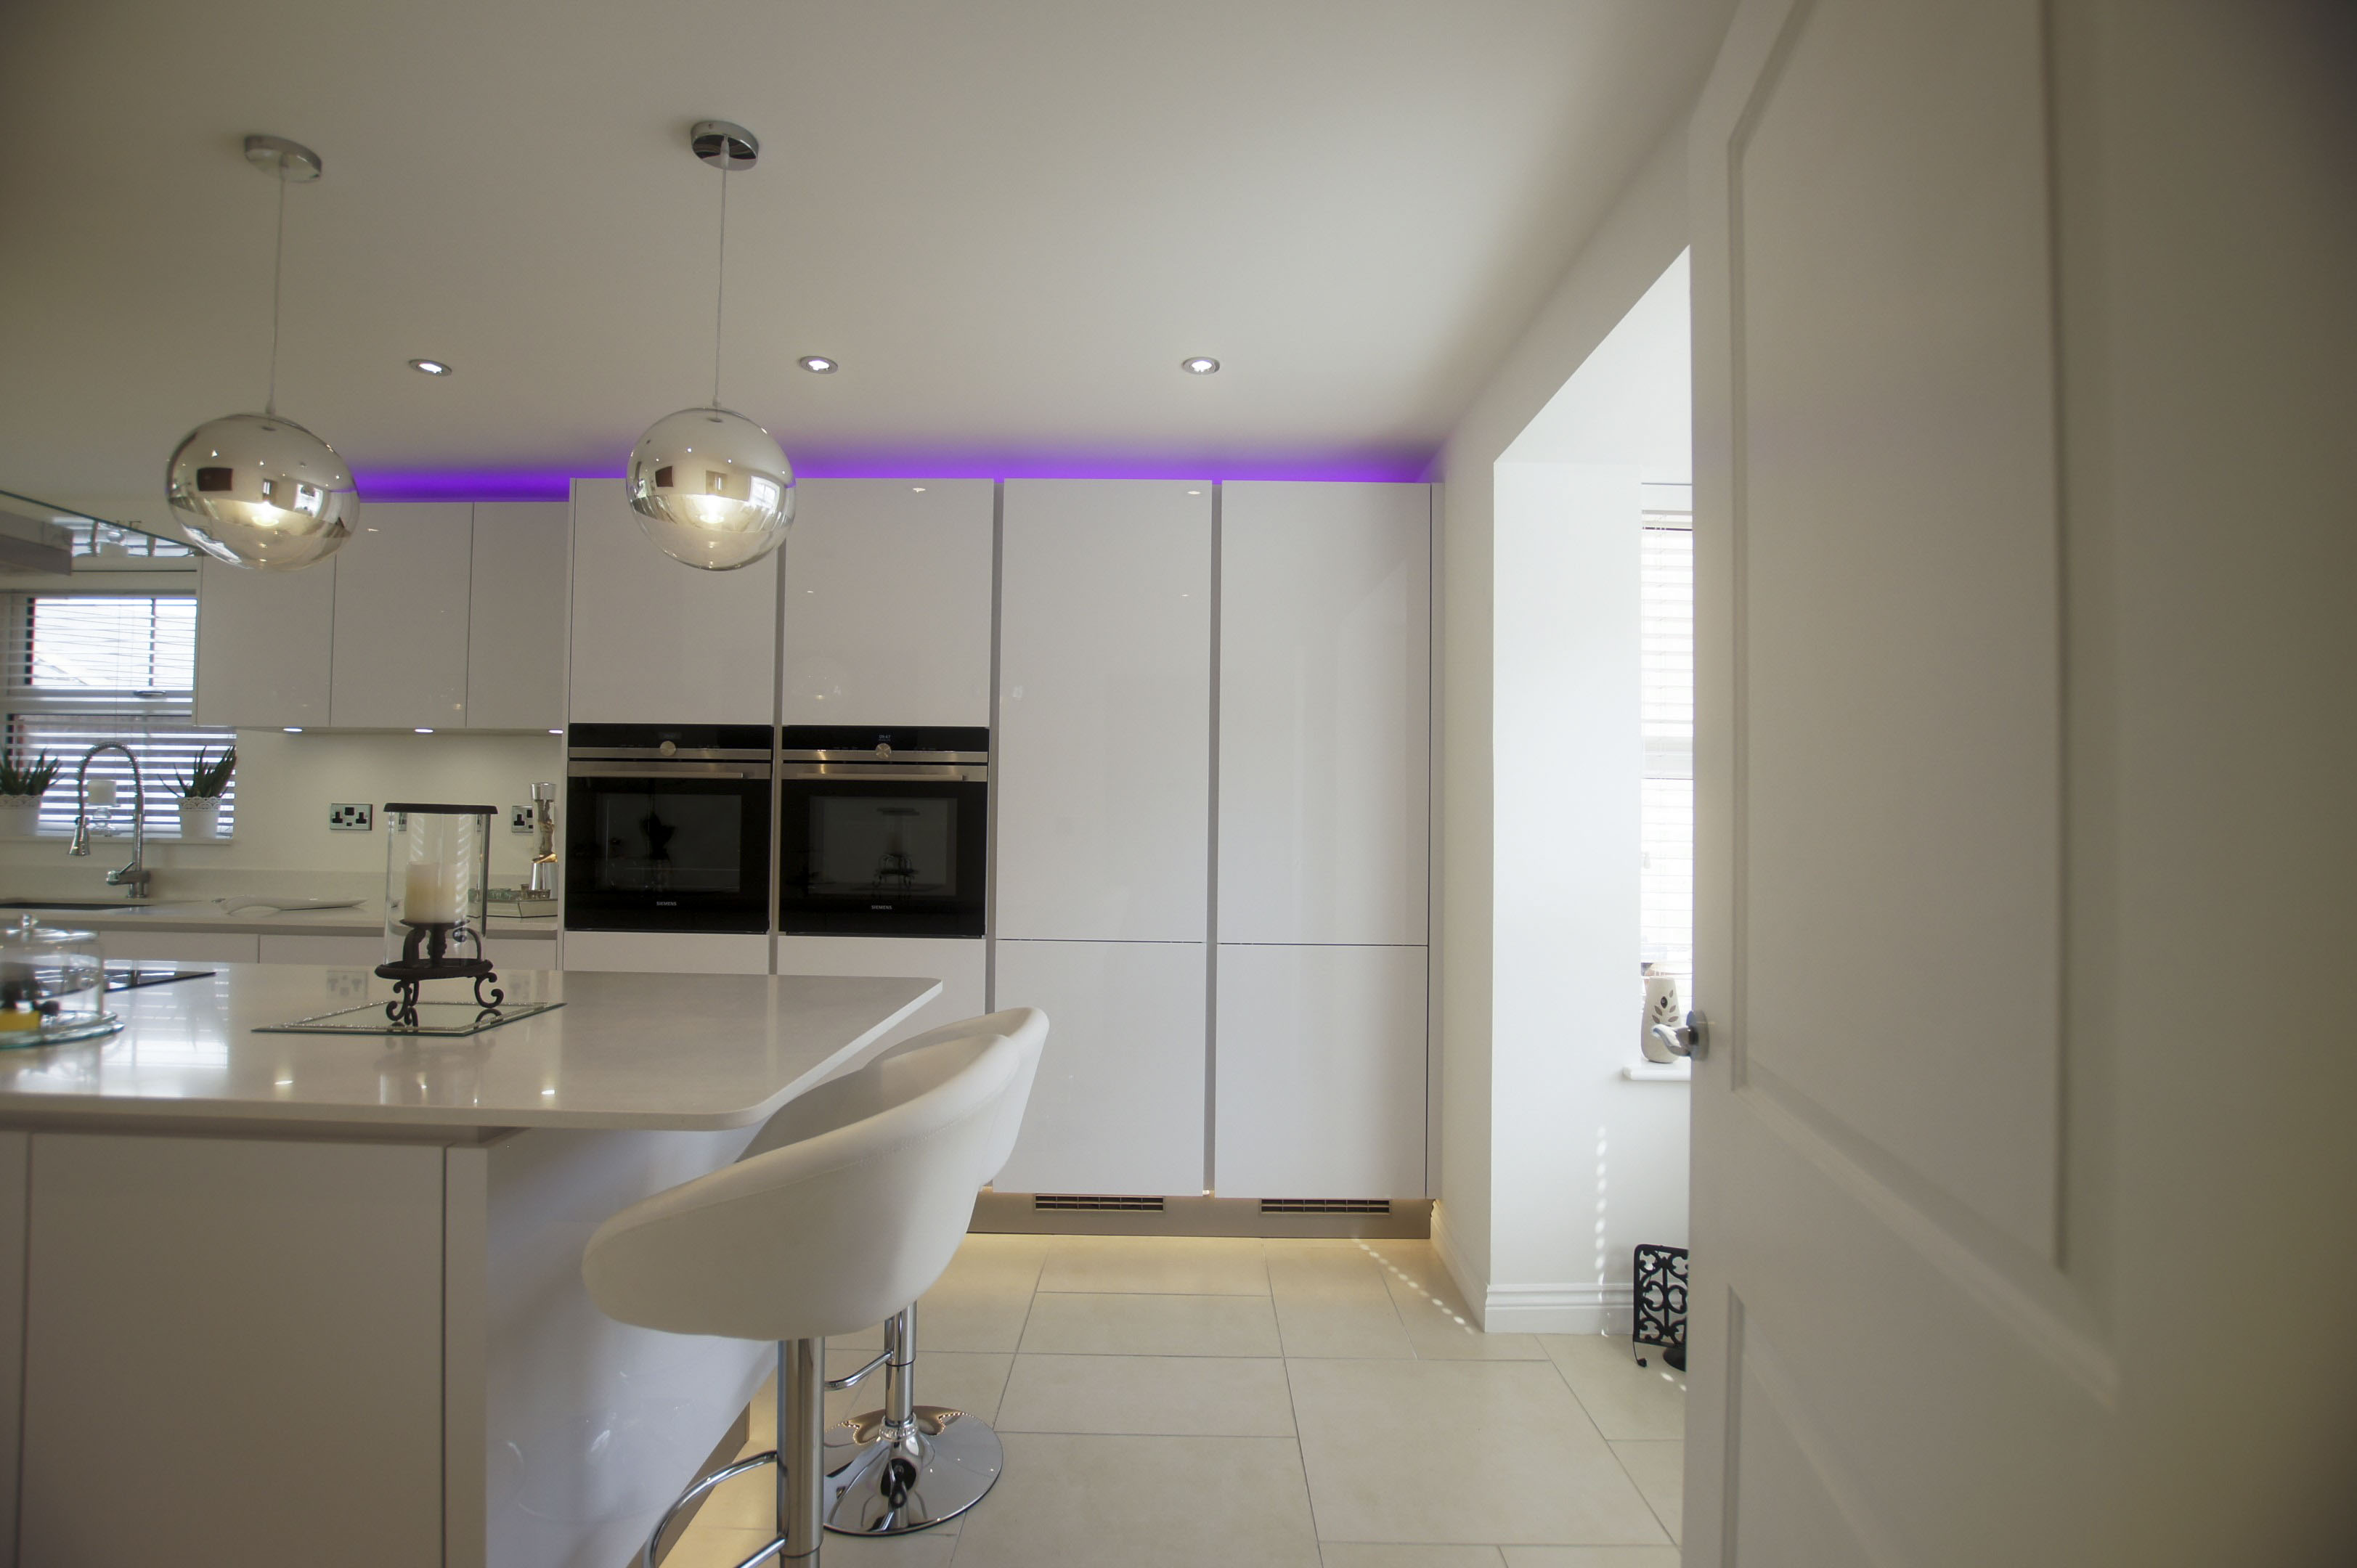 White Gloss Kitchen Cabinets High Gloss Kitchen Cabinets: White High Gloss German Kitchen - Buntingford